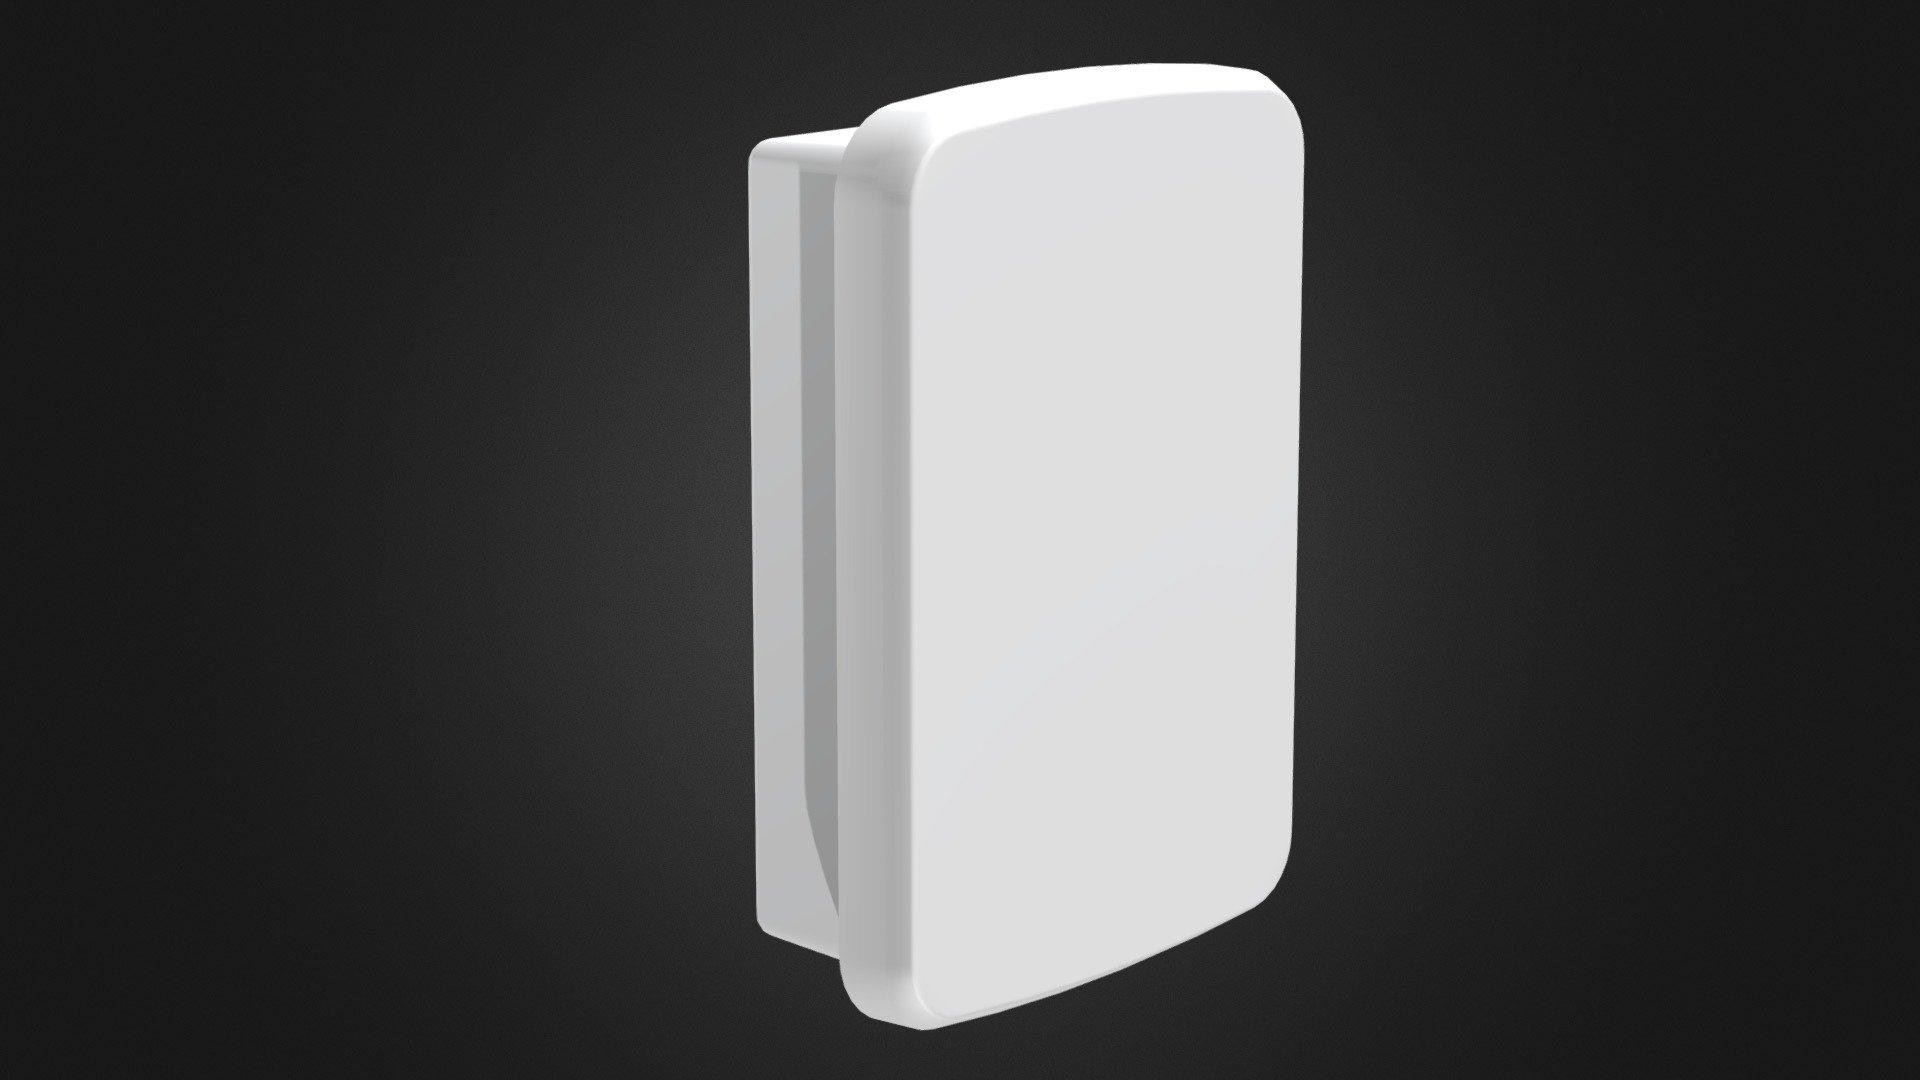 Frame Kit #21 - Download Free 3D model by